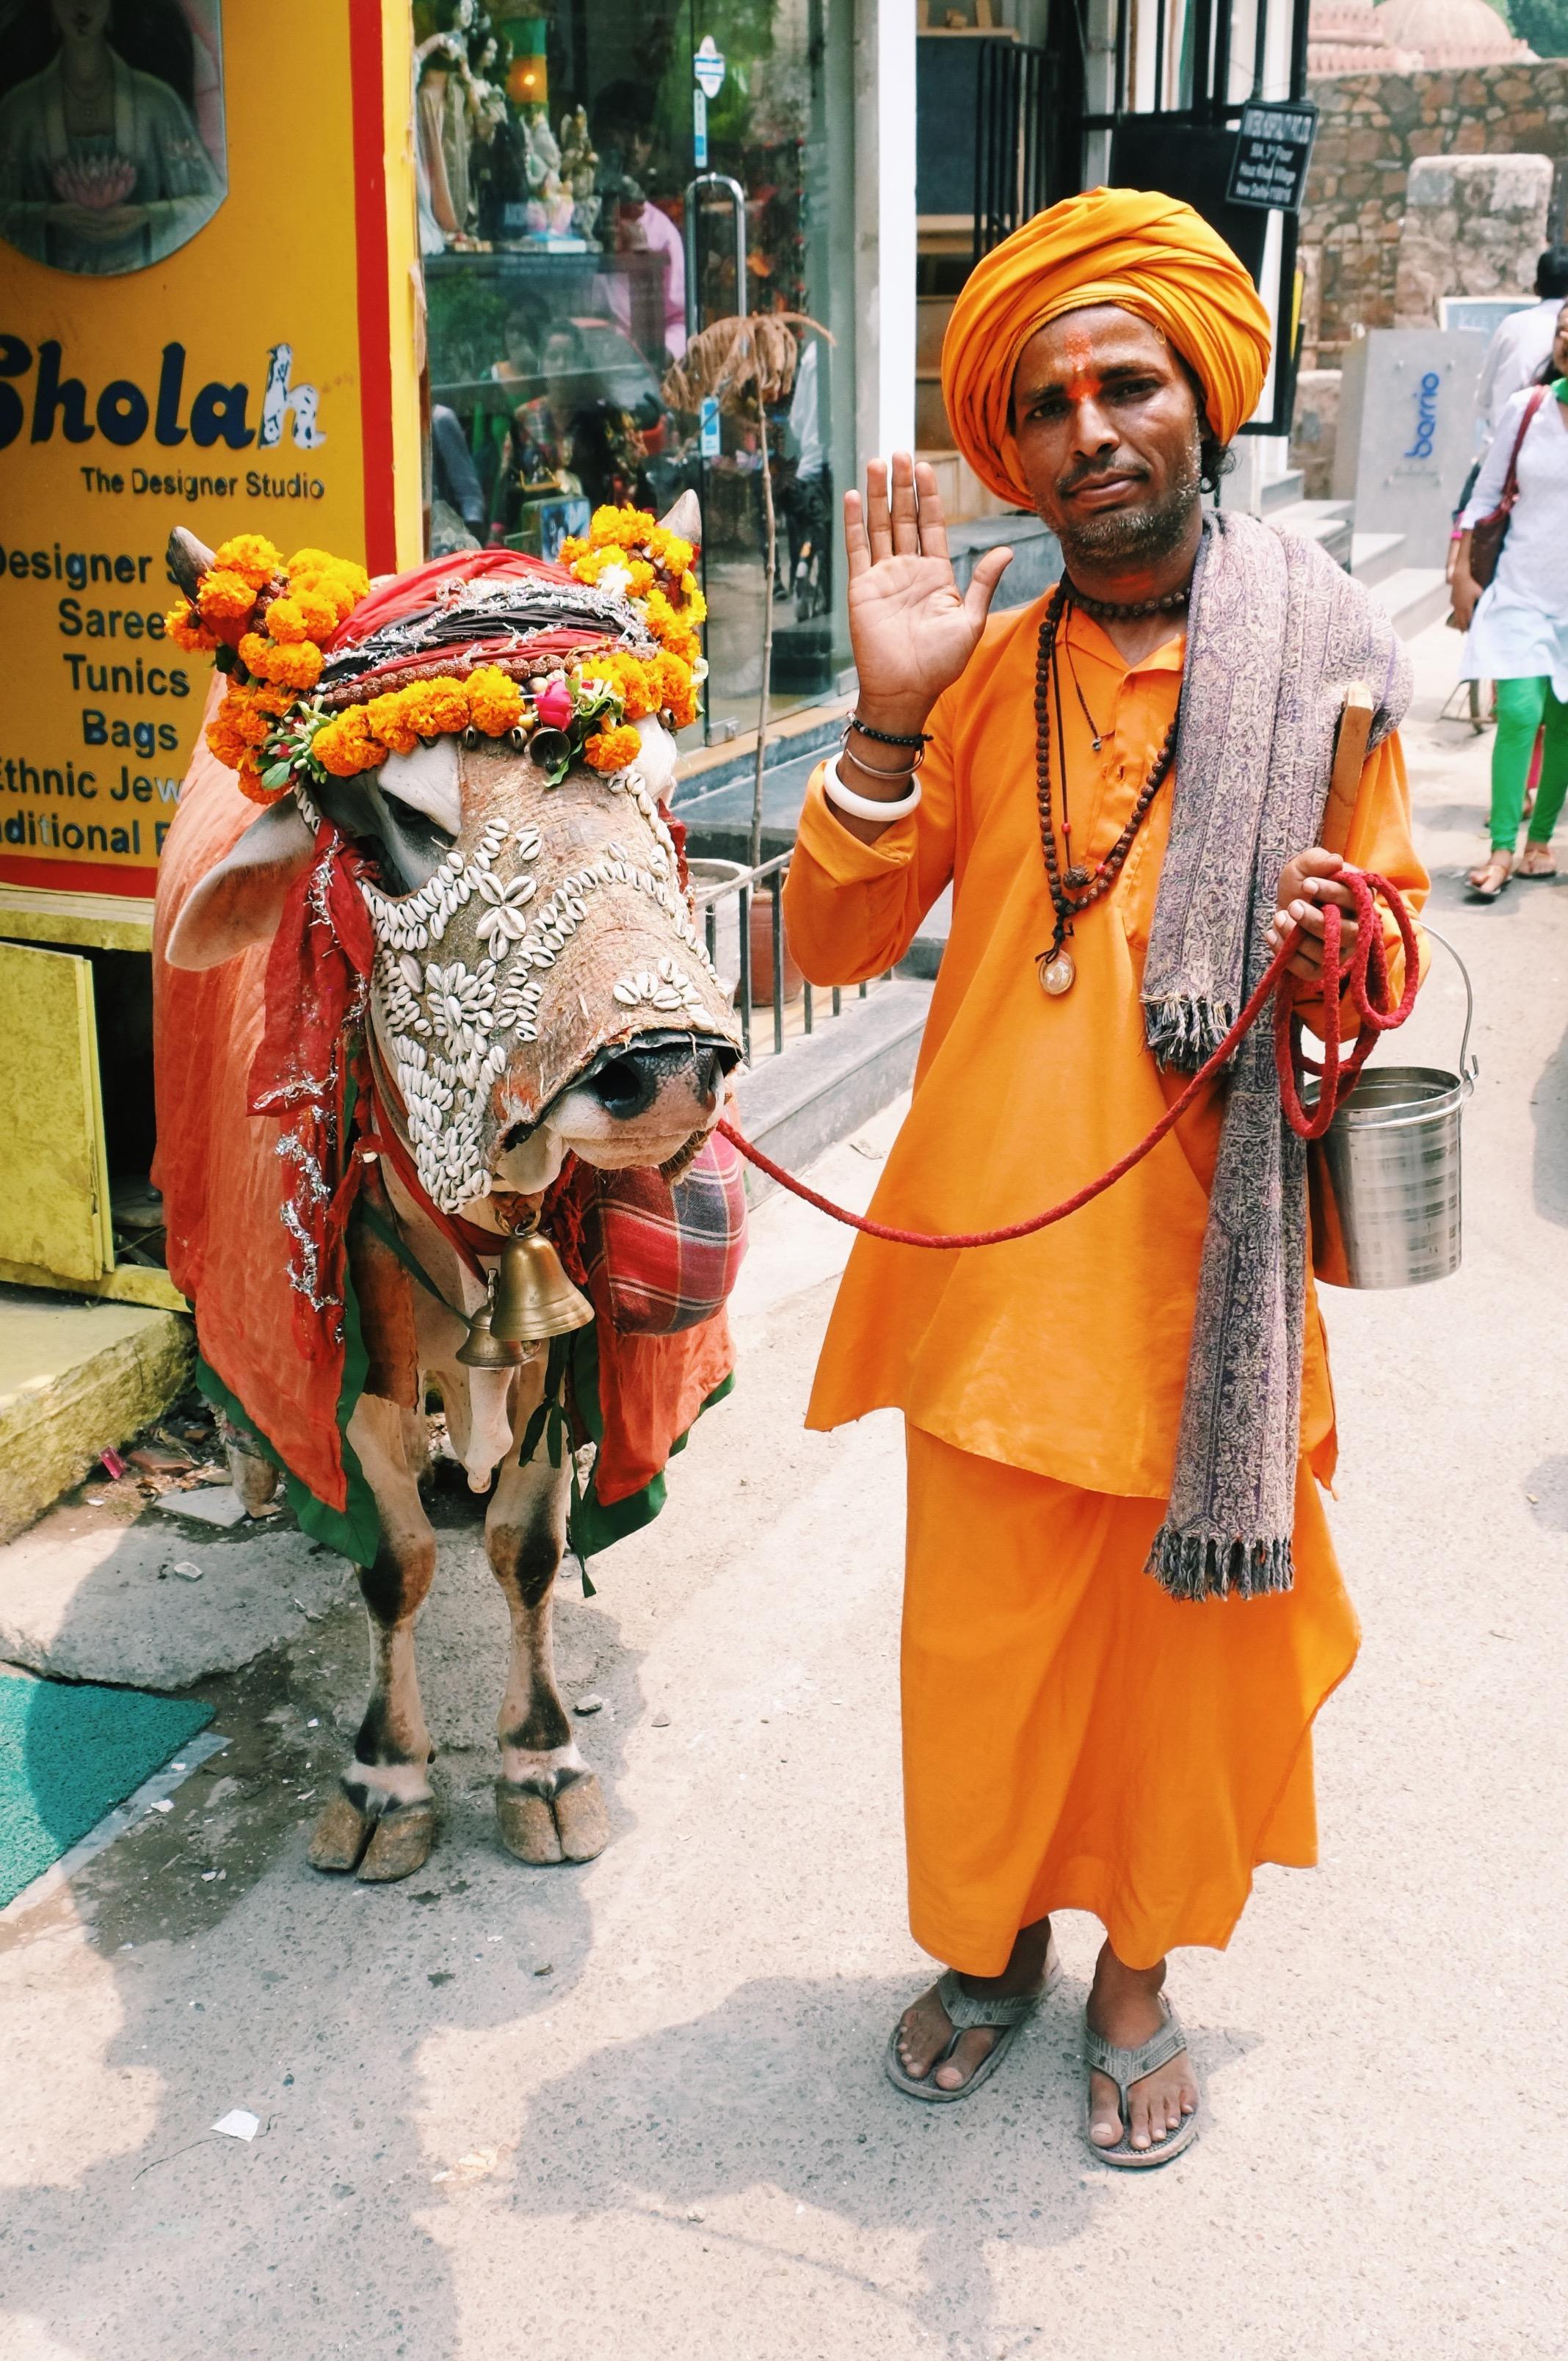 Holy Cow India Joost Bastmeijer.jpeg